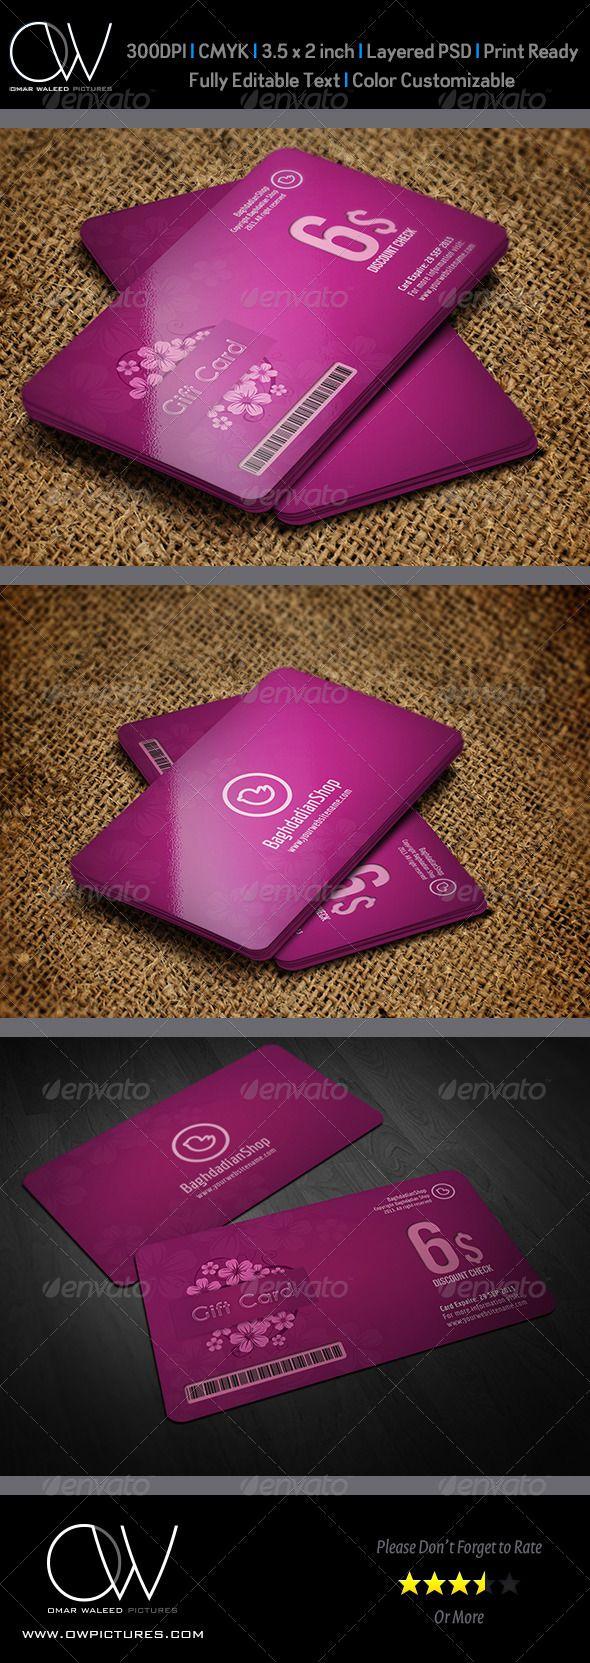 58 best voucher images on pinterest brand identity gift gift voucher card vol 6 xflitez Images